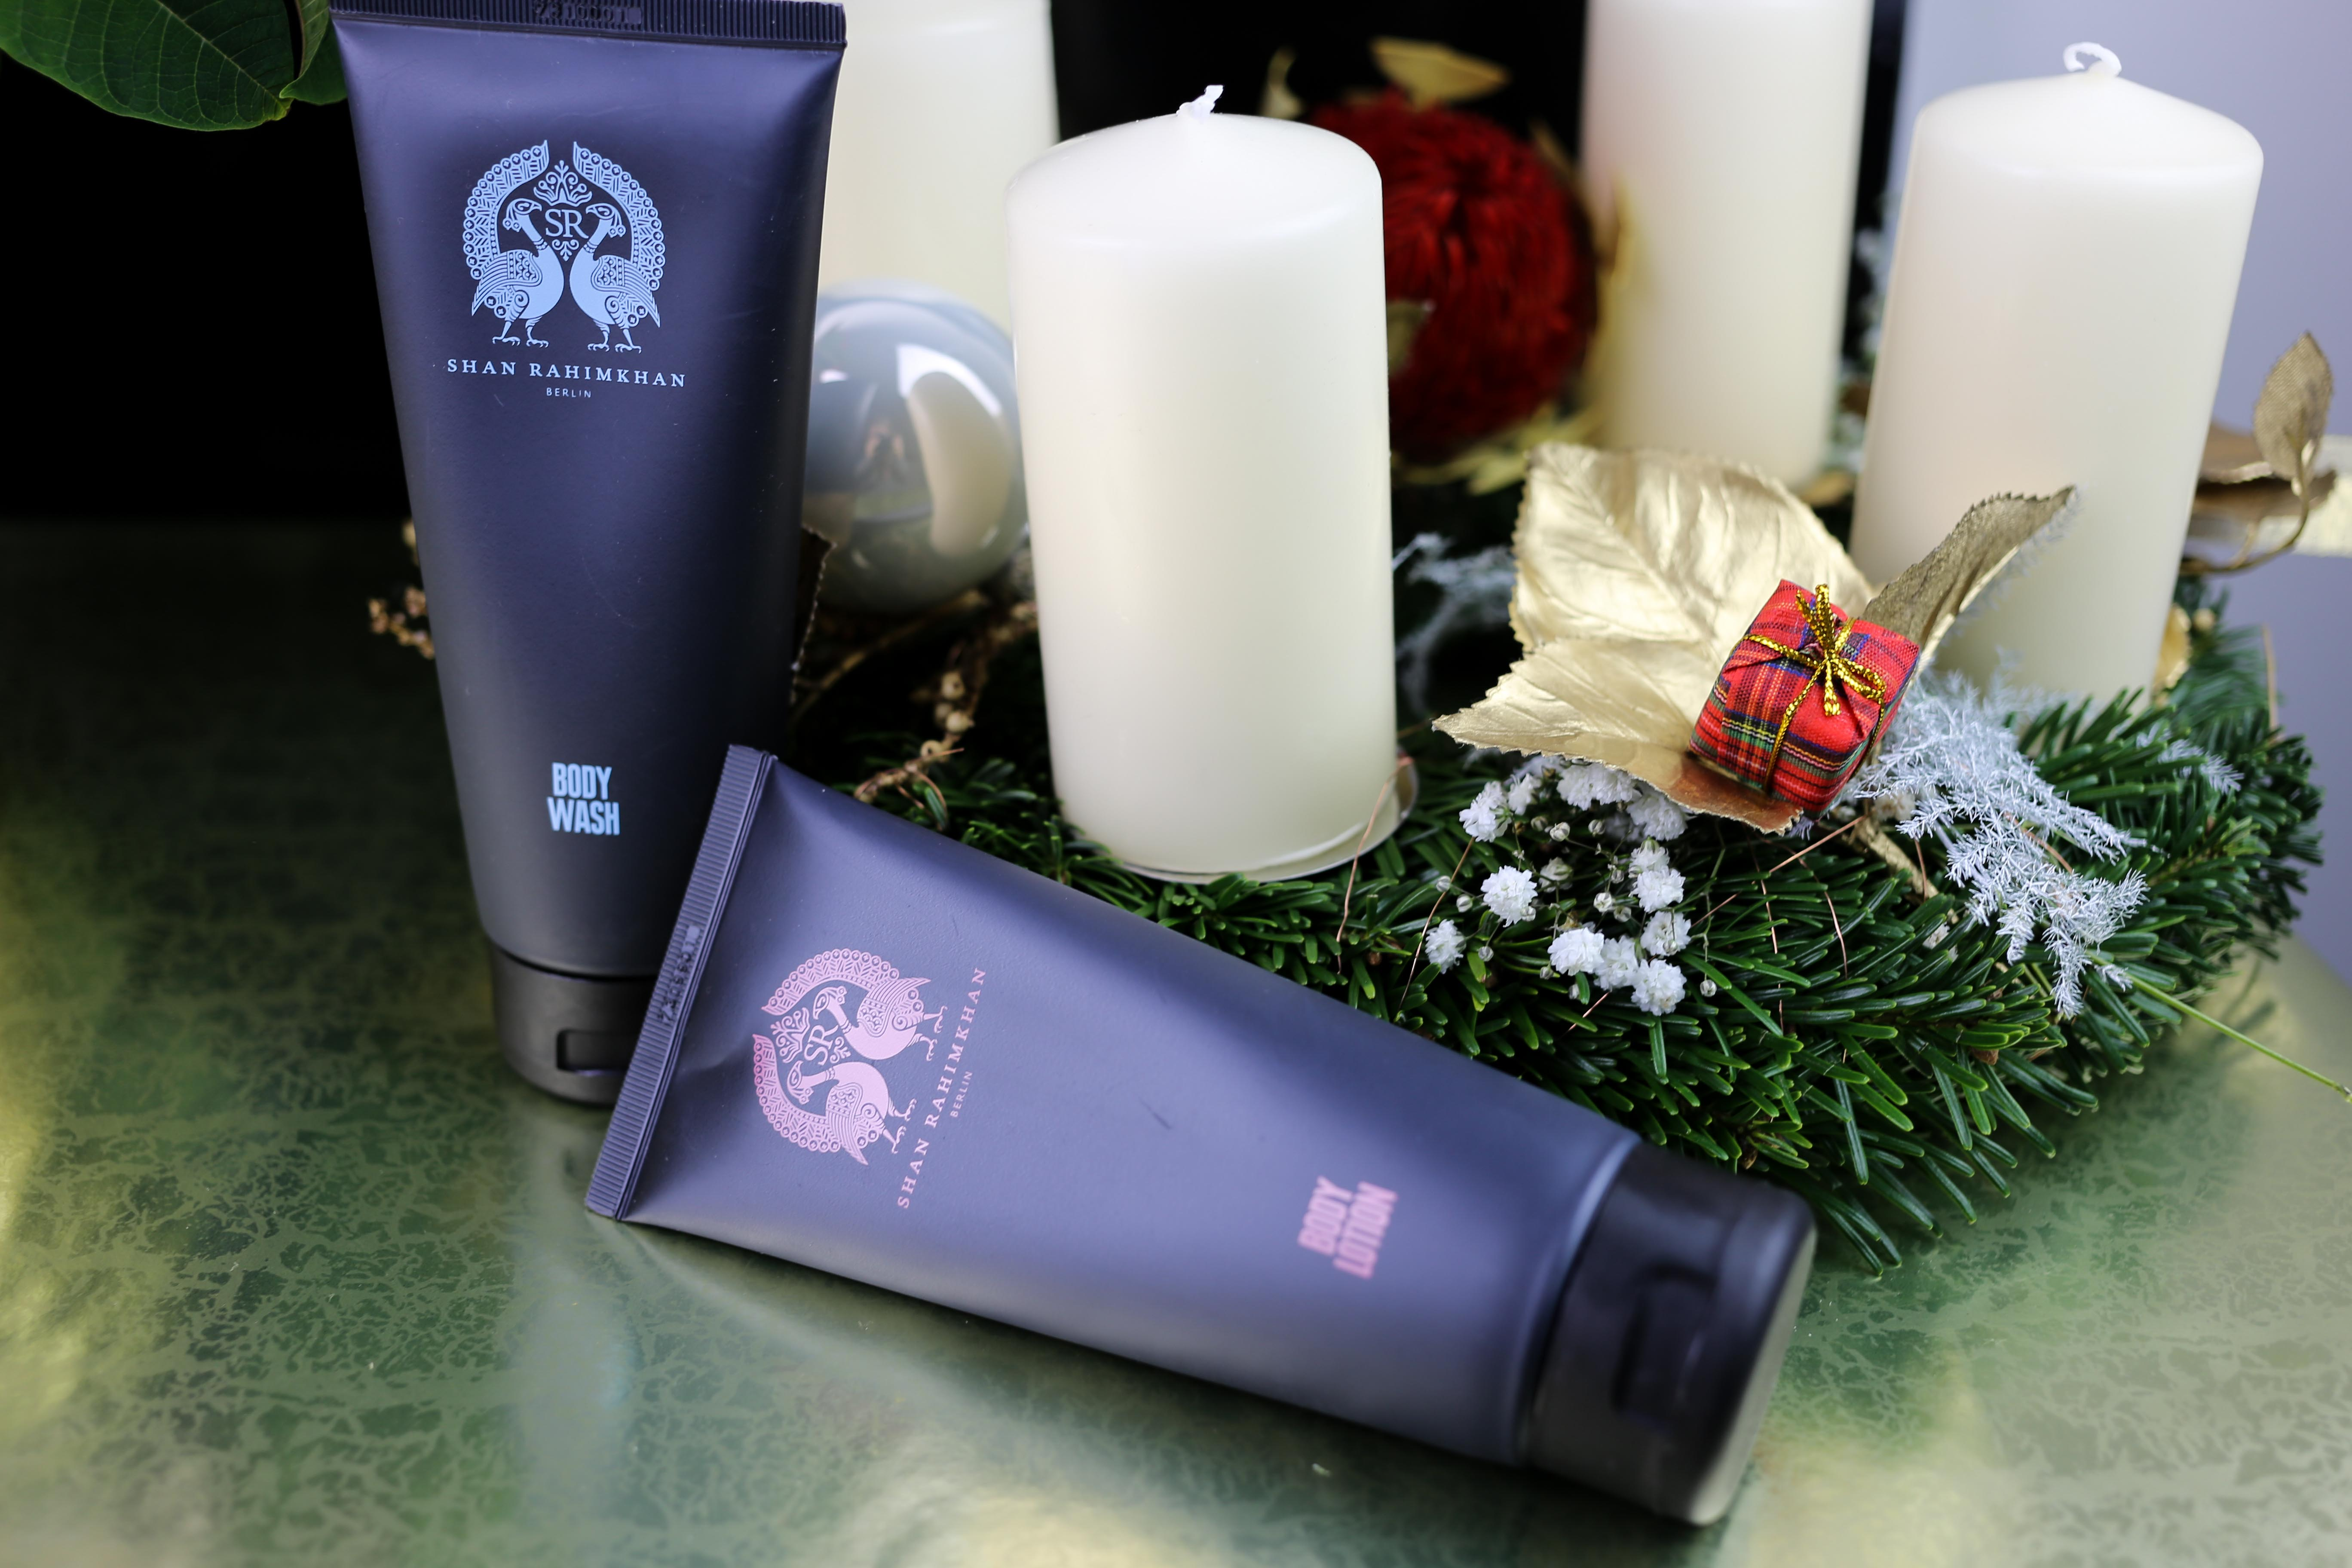 Shan-Rahimkhan-Pflegeset-Shampoo-Duschgel-Wellness-Beauty